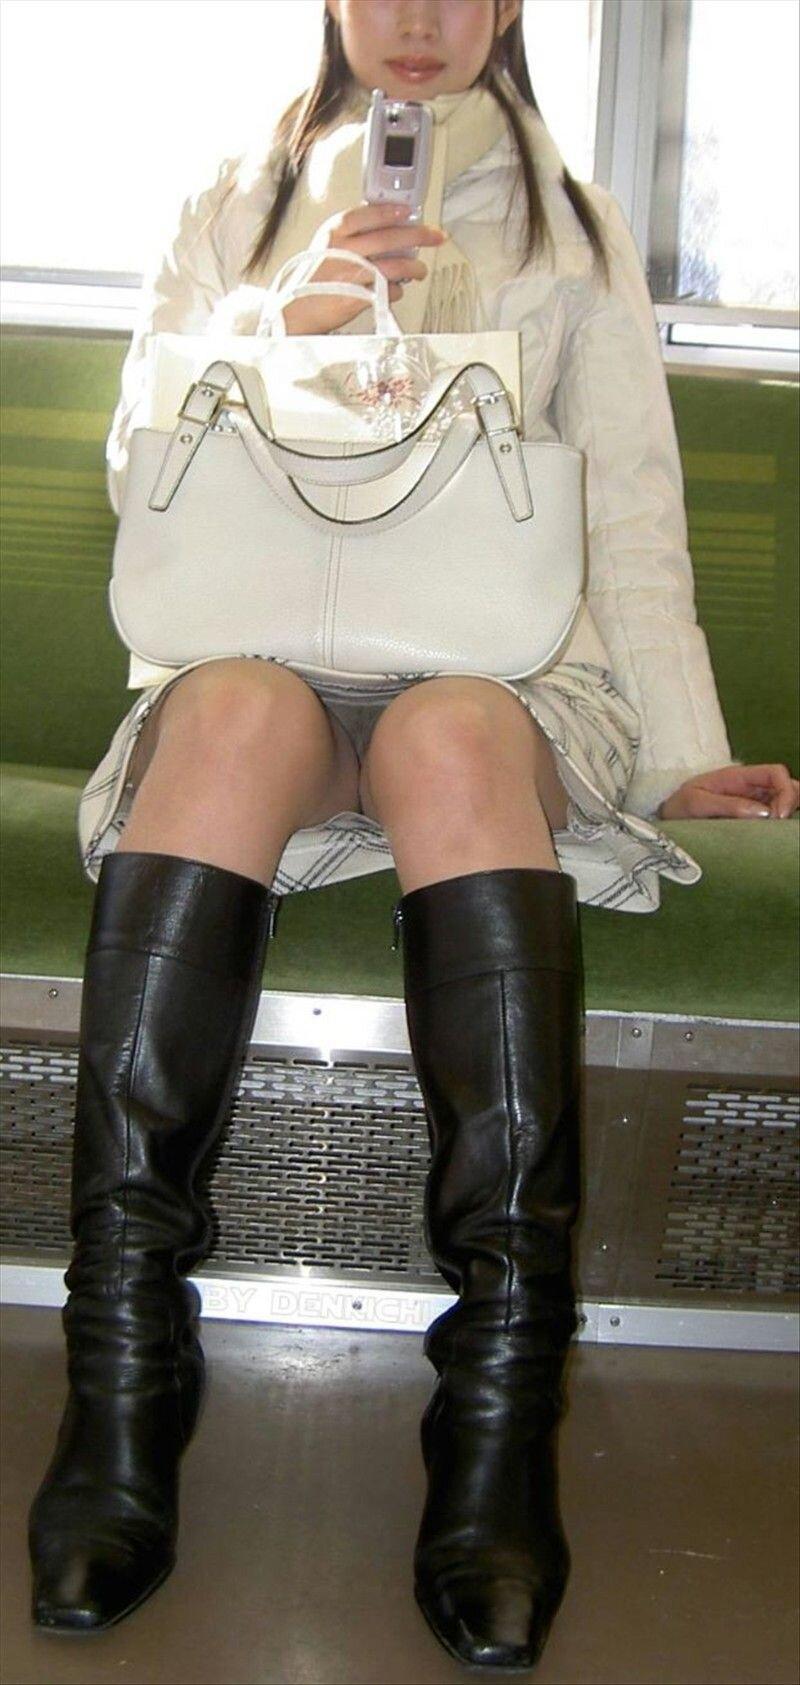 поближе, в колготках под юбкой в транспорте матери